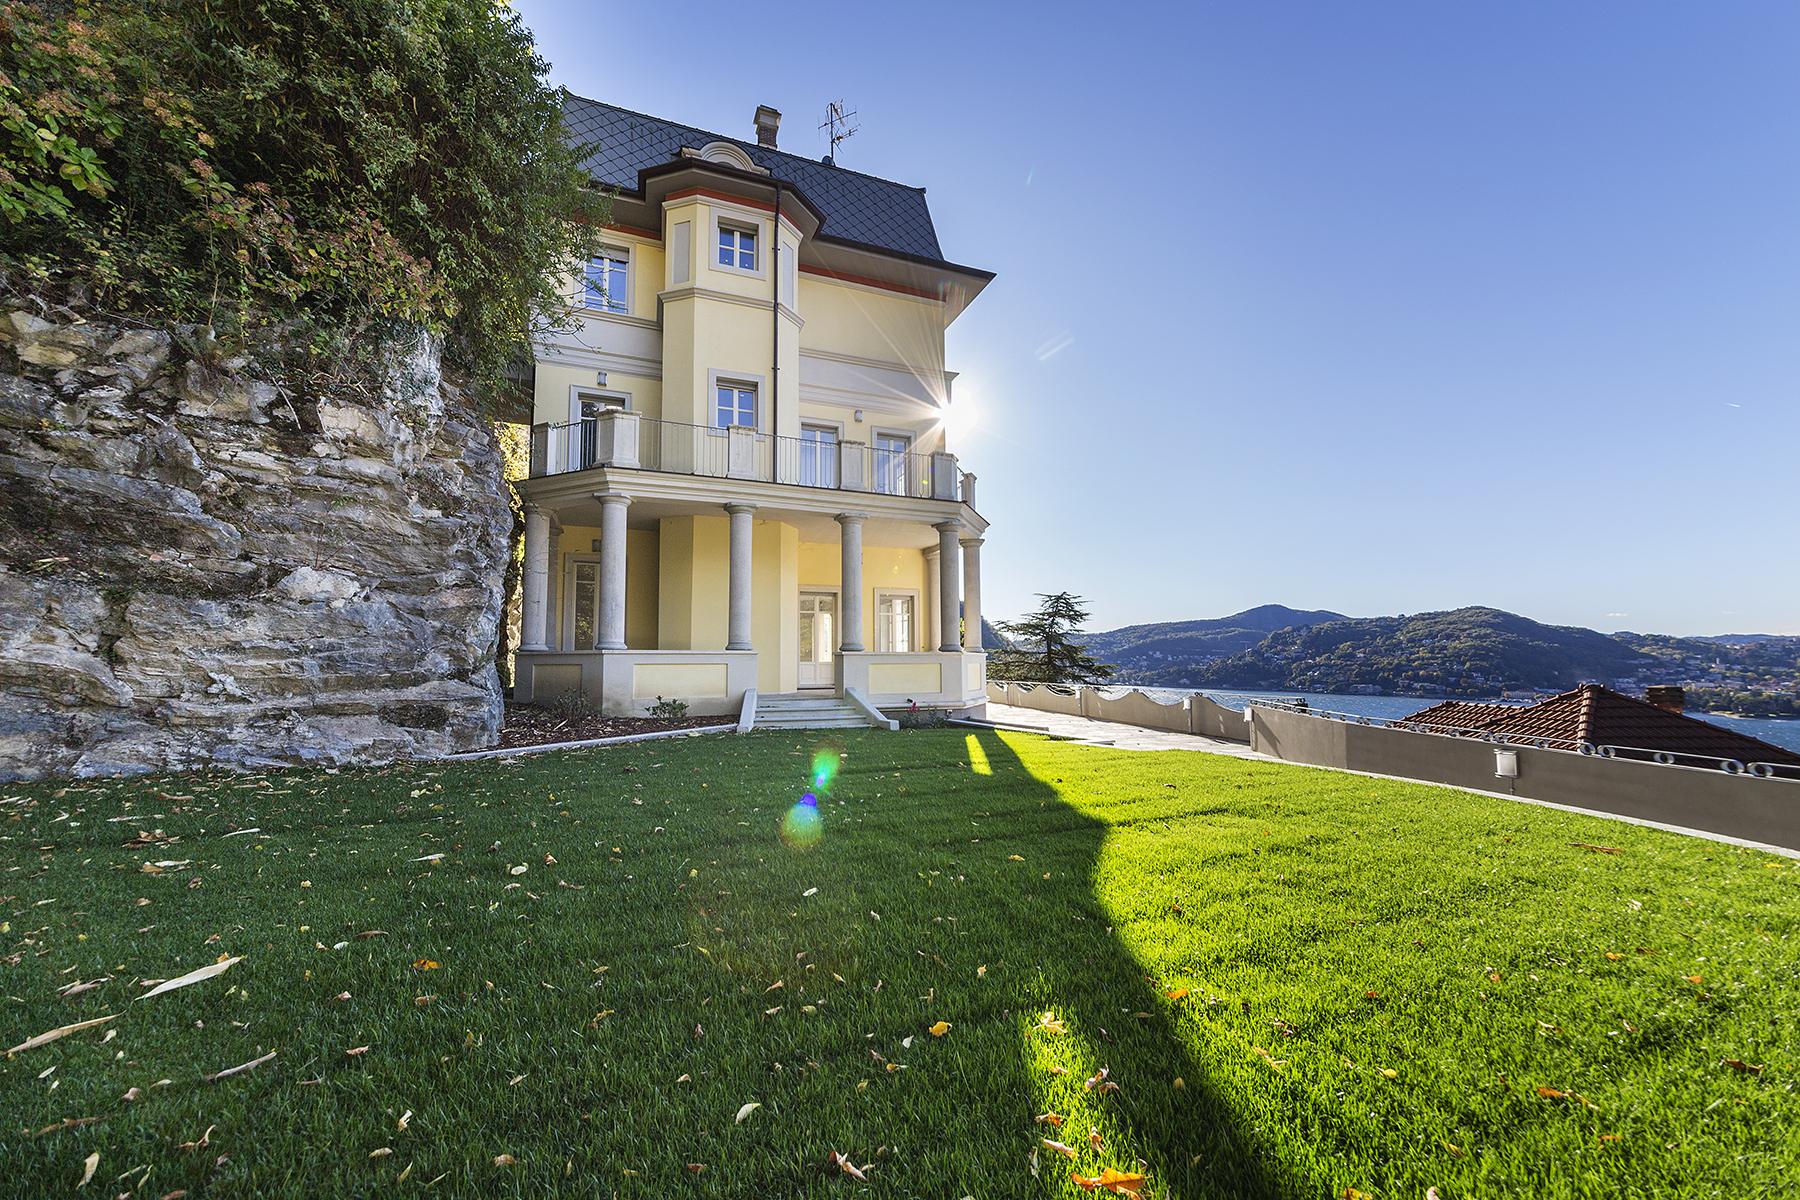 شقة للـ Sale في Apartment with private garden in historical villa Blevio, Como, Italy